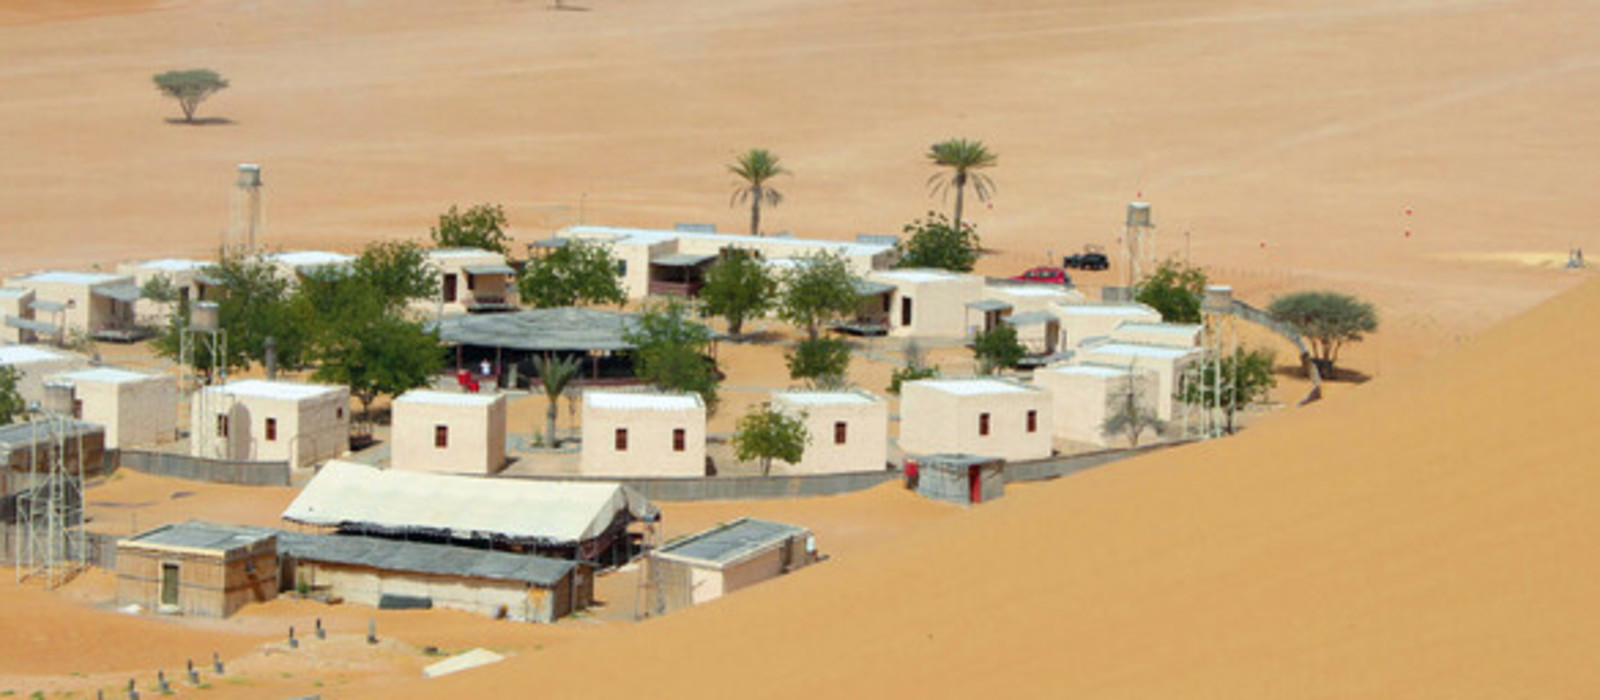 Hotel Sama Al Wasil Camp Oman